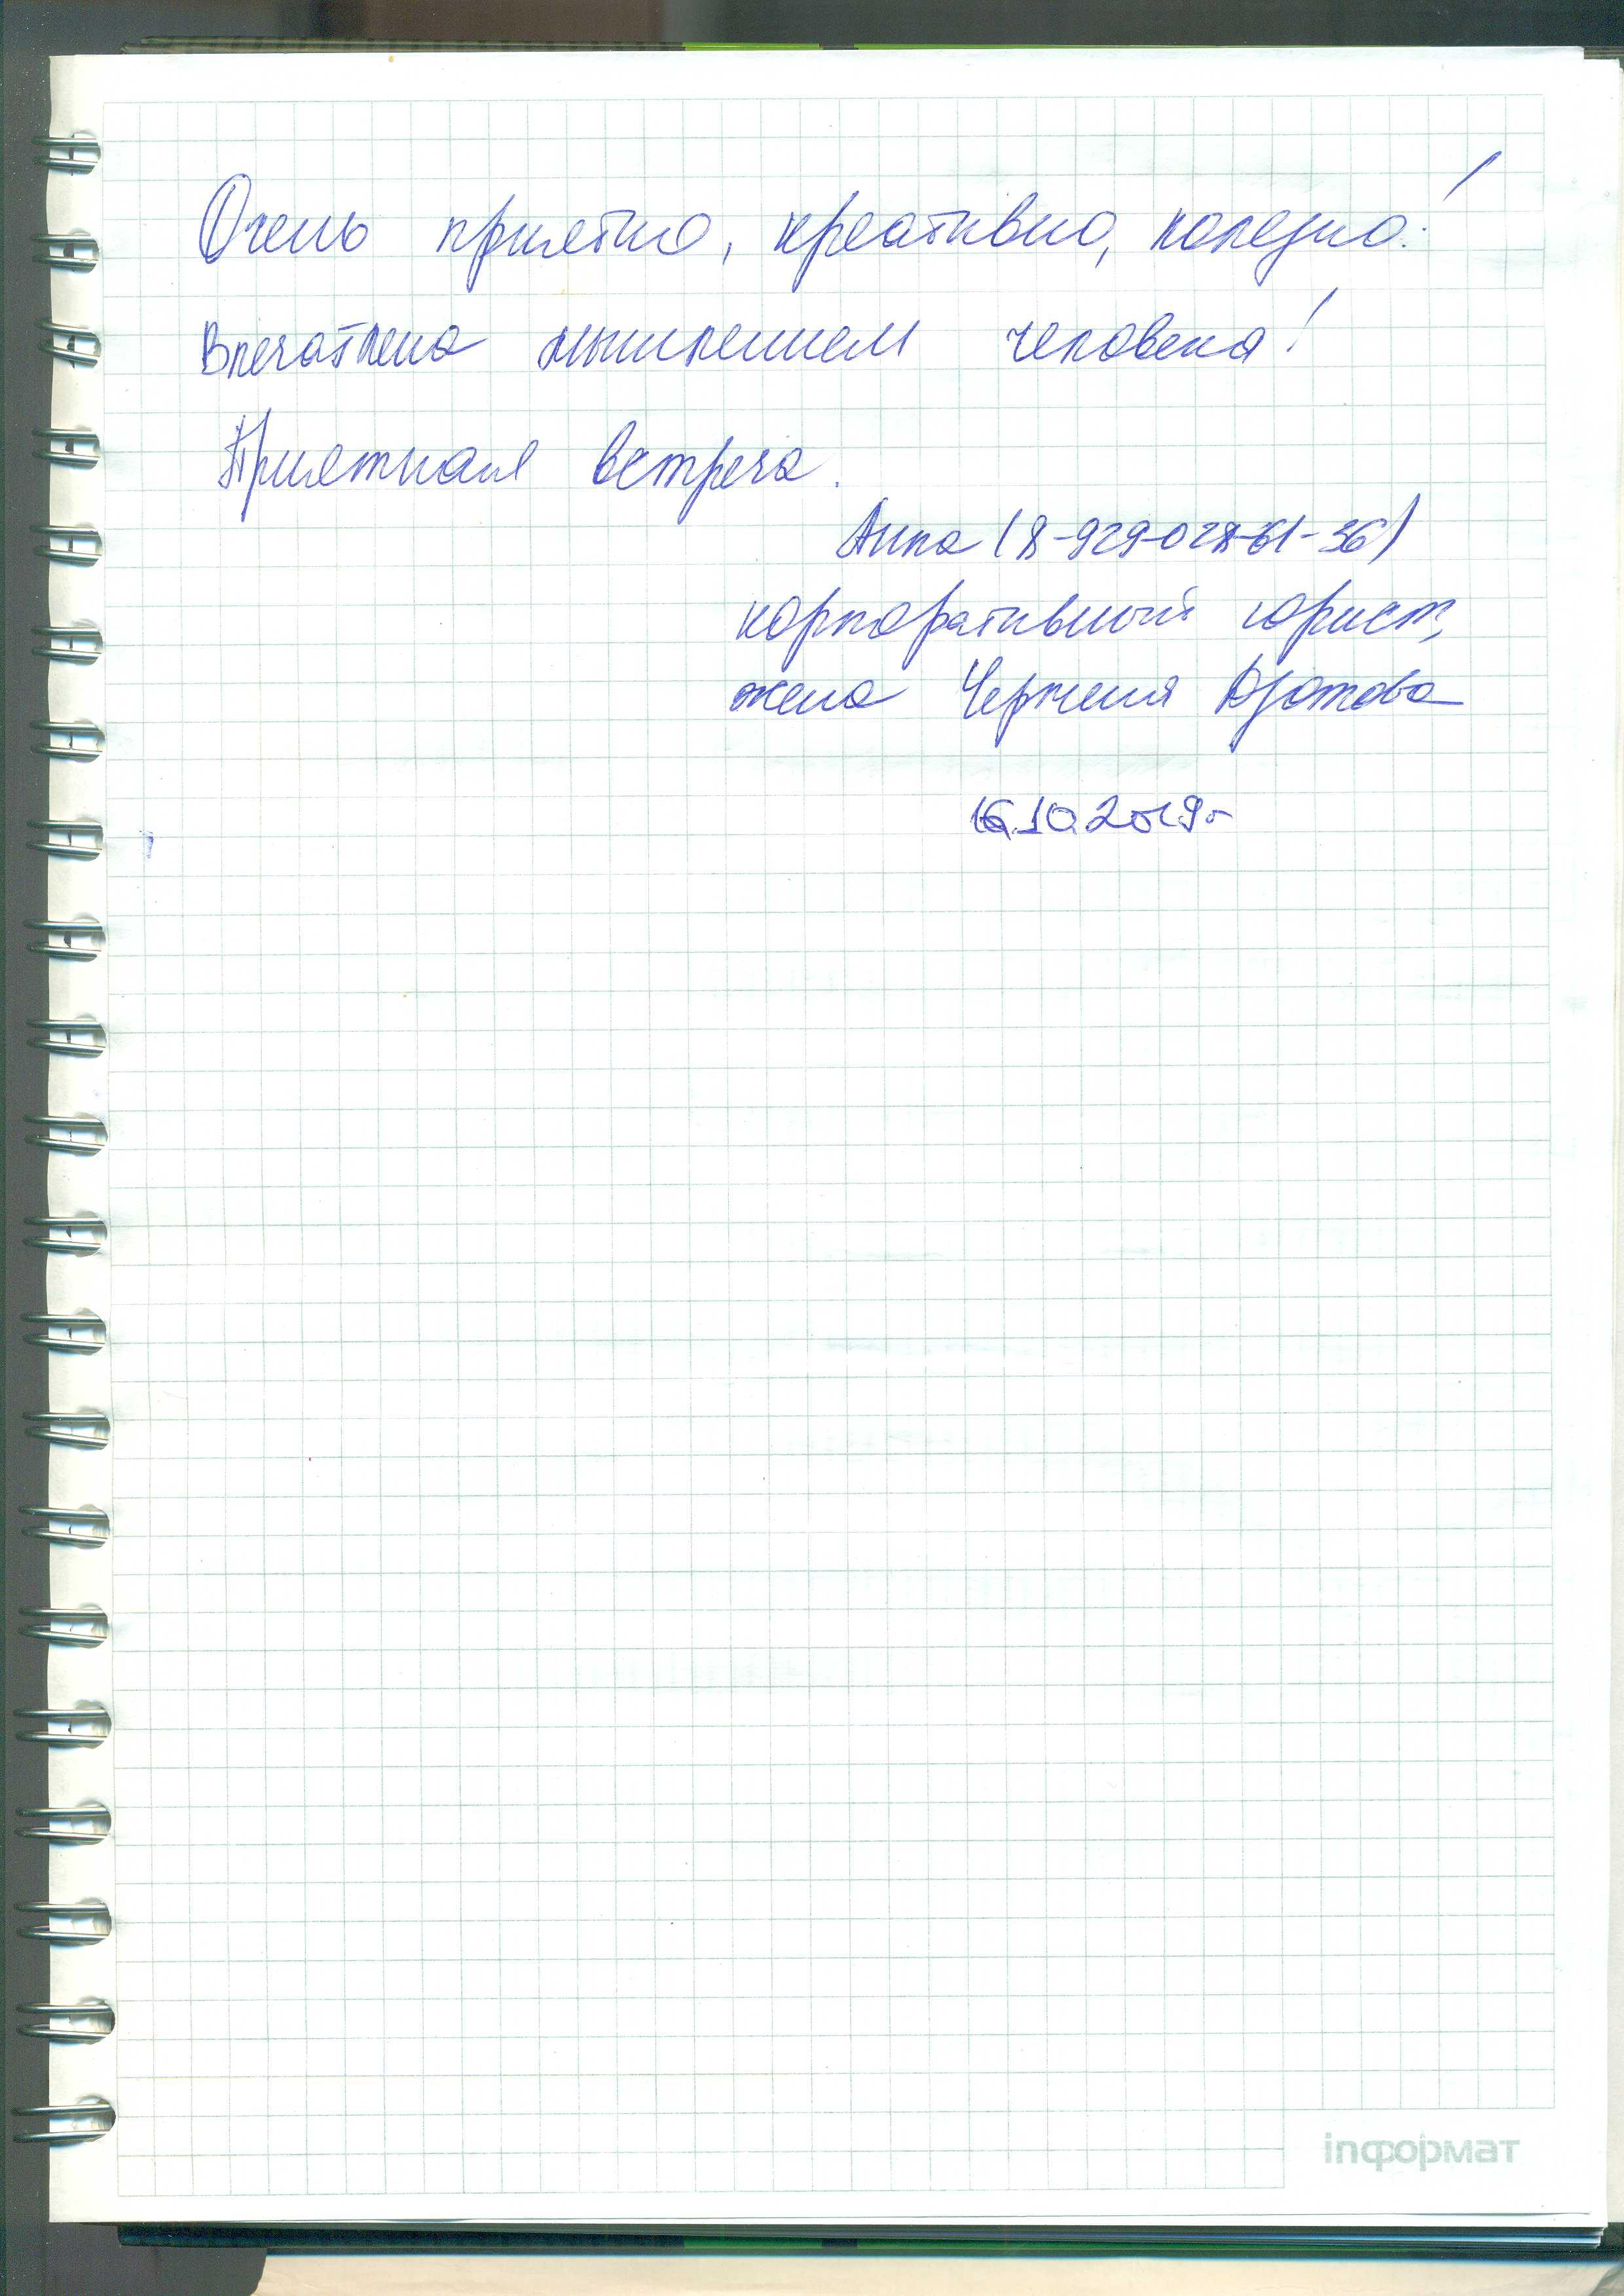 16102019_1